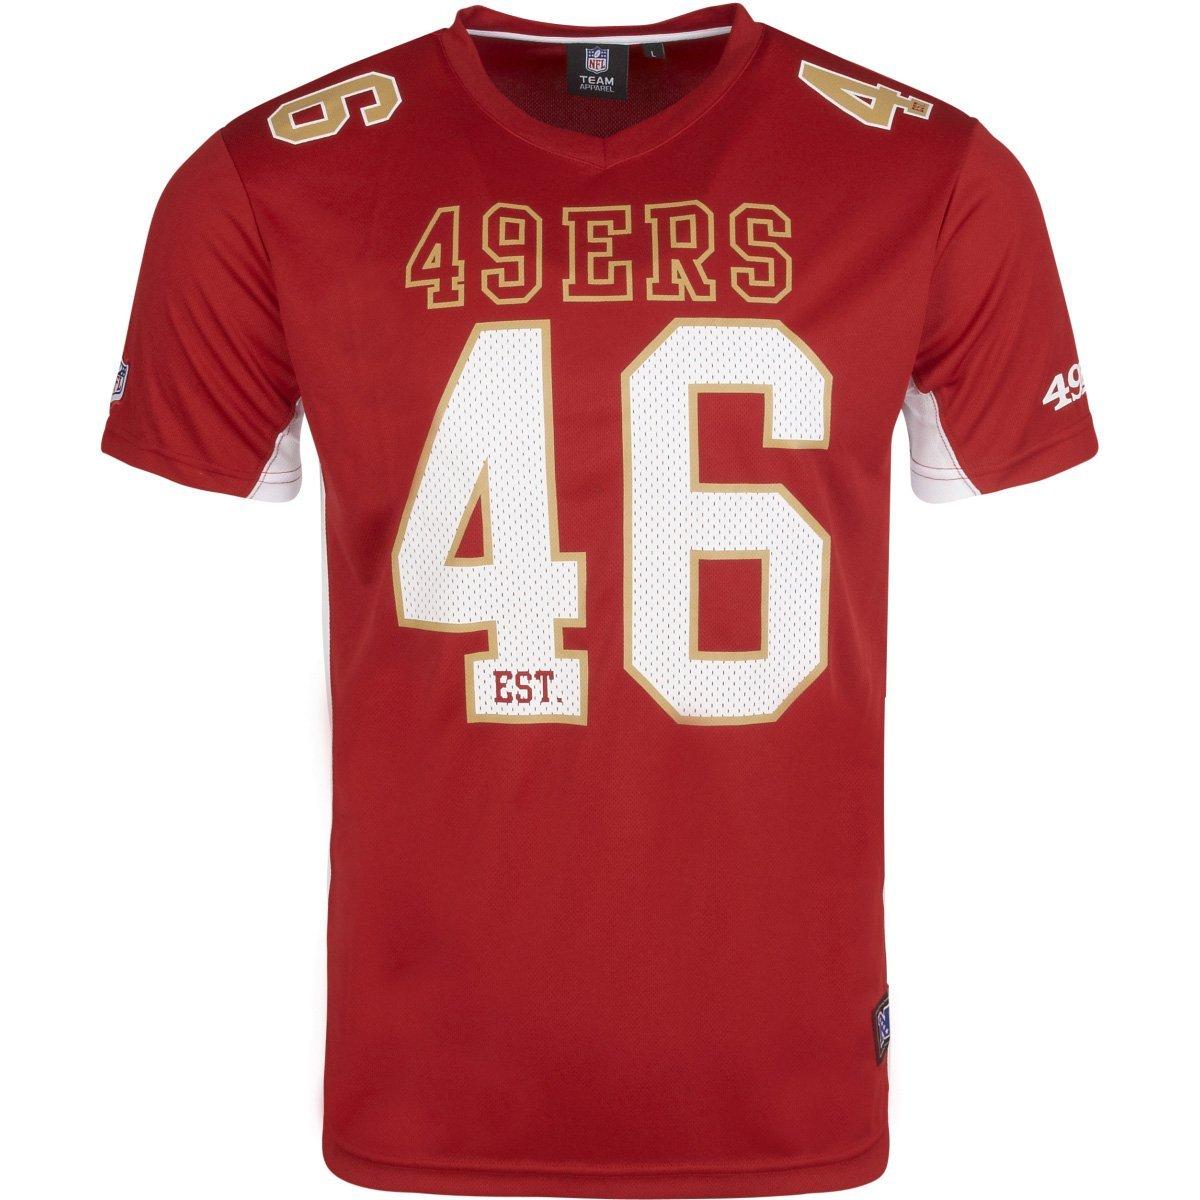 Majestic San Francisco 49ers Moro Est. 46 Mesh Jersey NFL T-Shirt majestic athletics